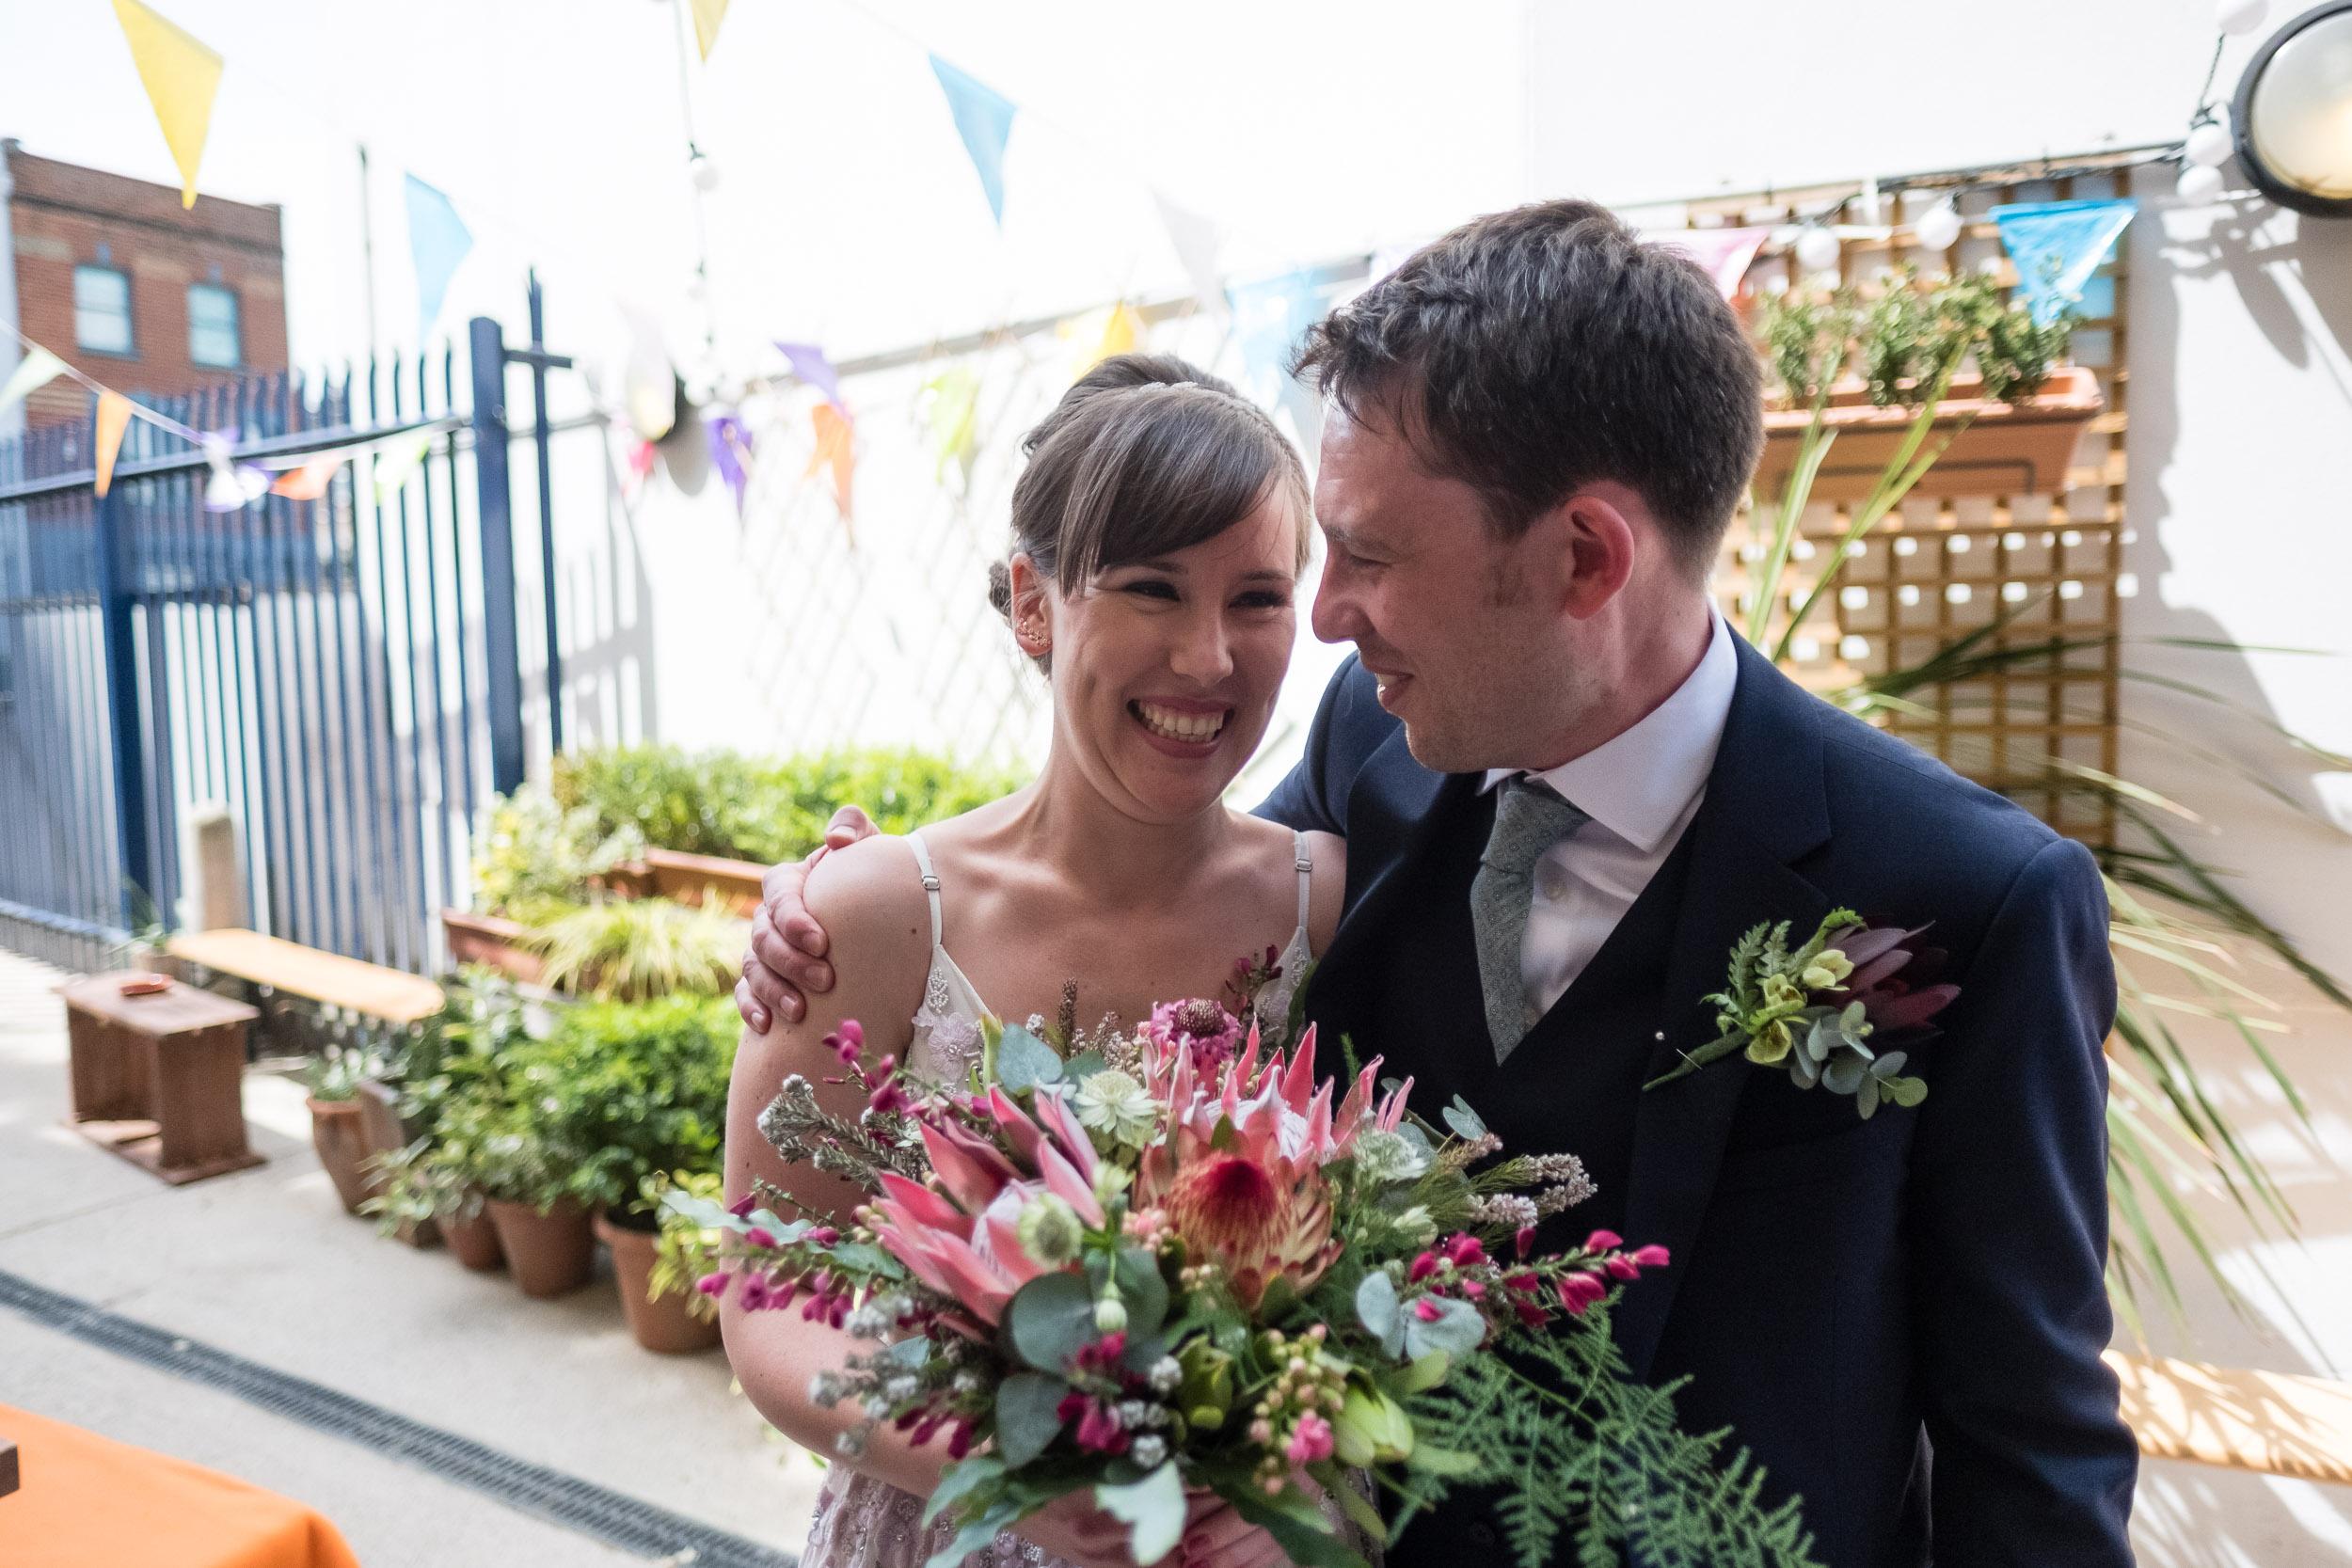 brockwell-lido-brixton-herne-hill-wedding-051.jpg